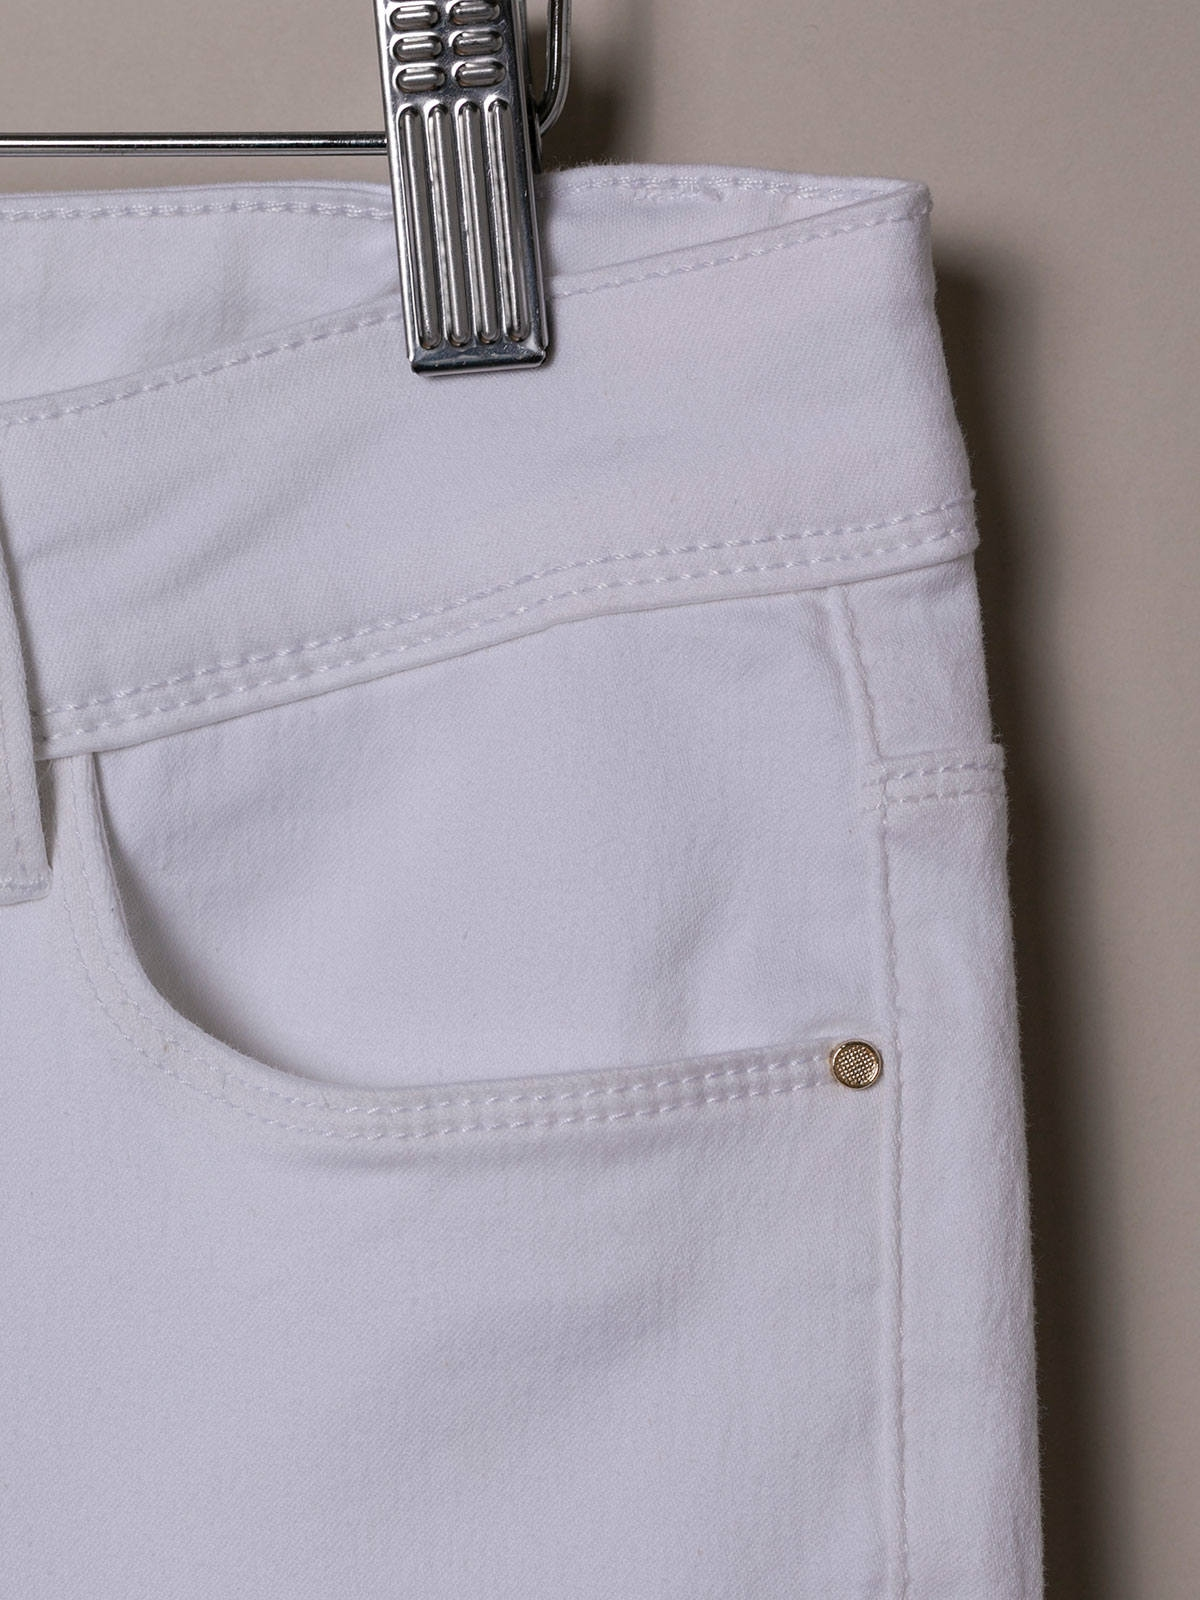 Pantalón mujer 5 bolsillos elastico Blanco